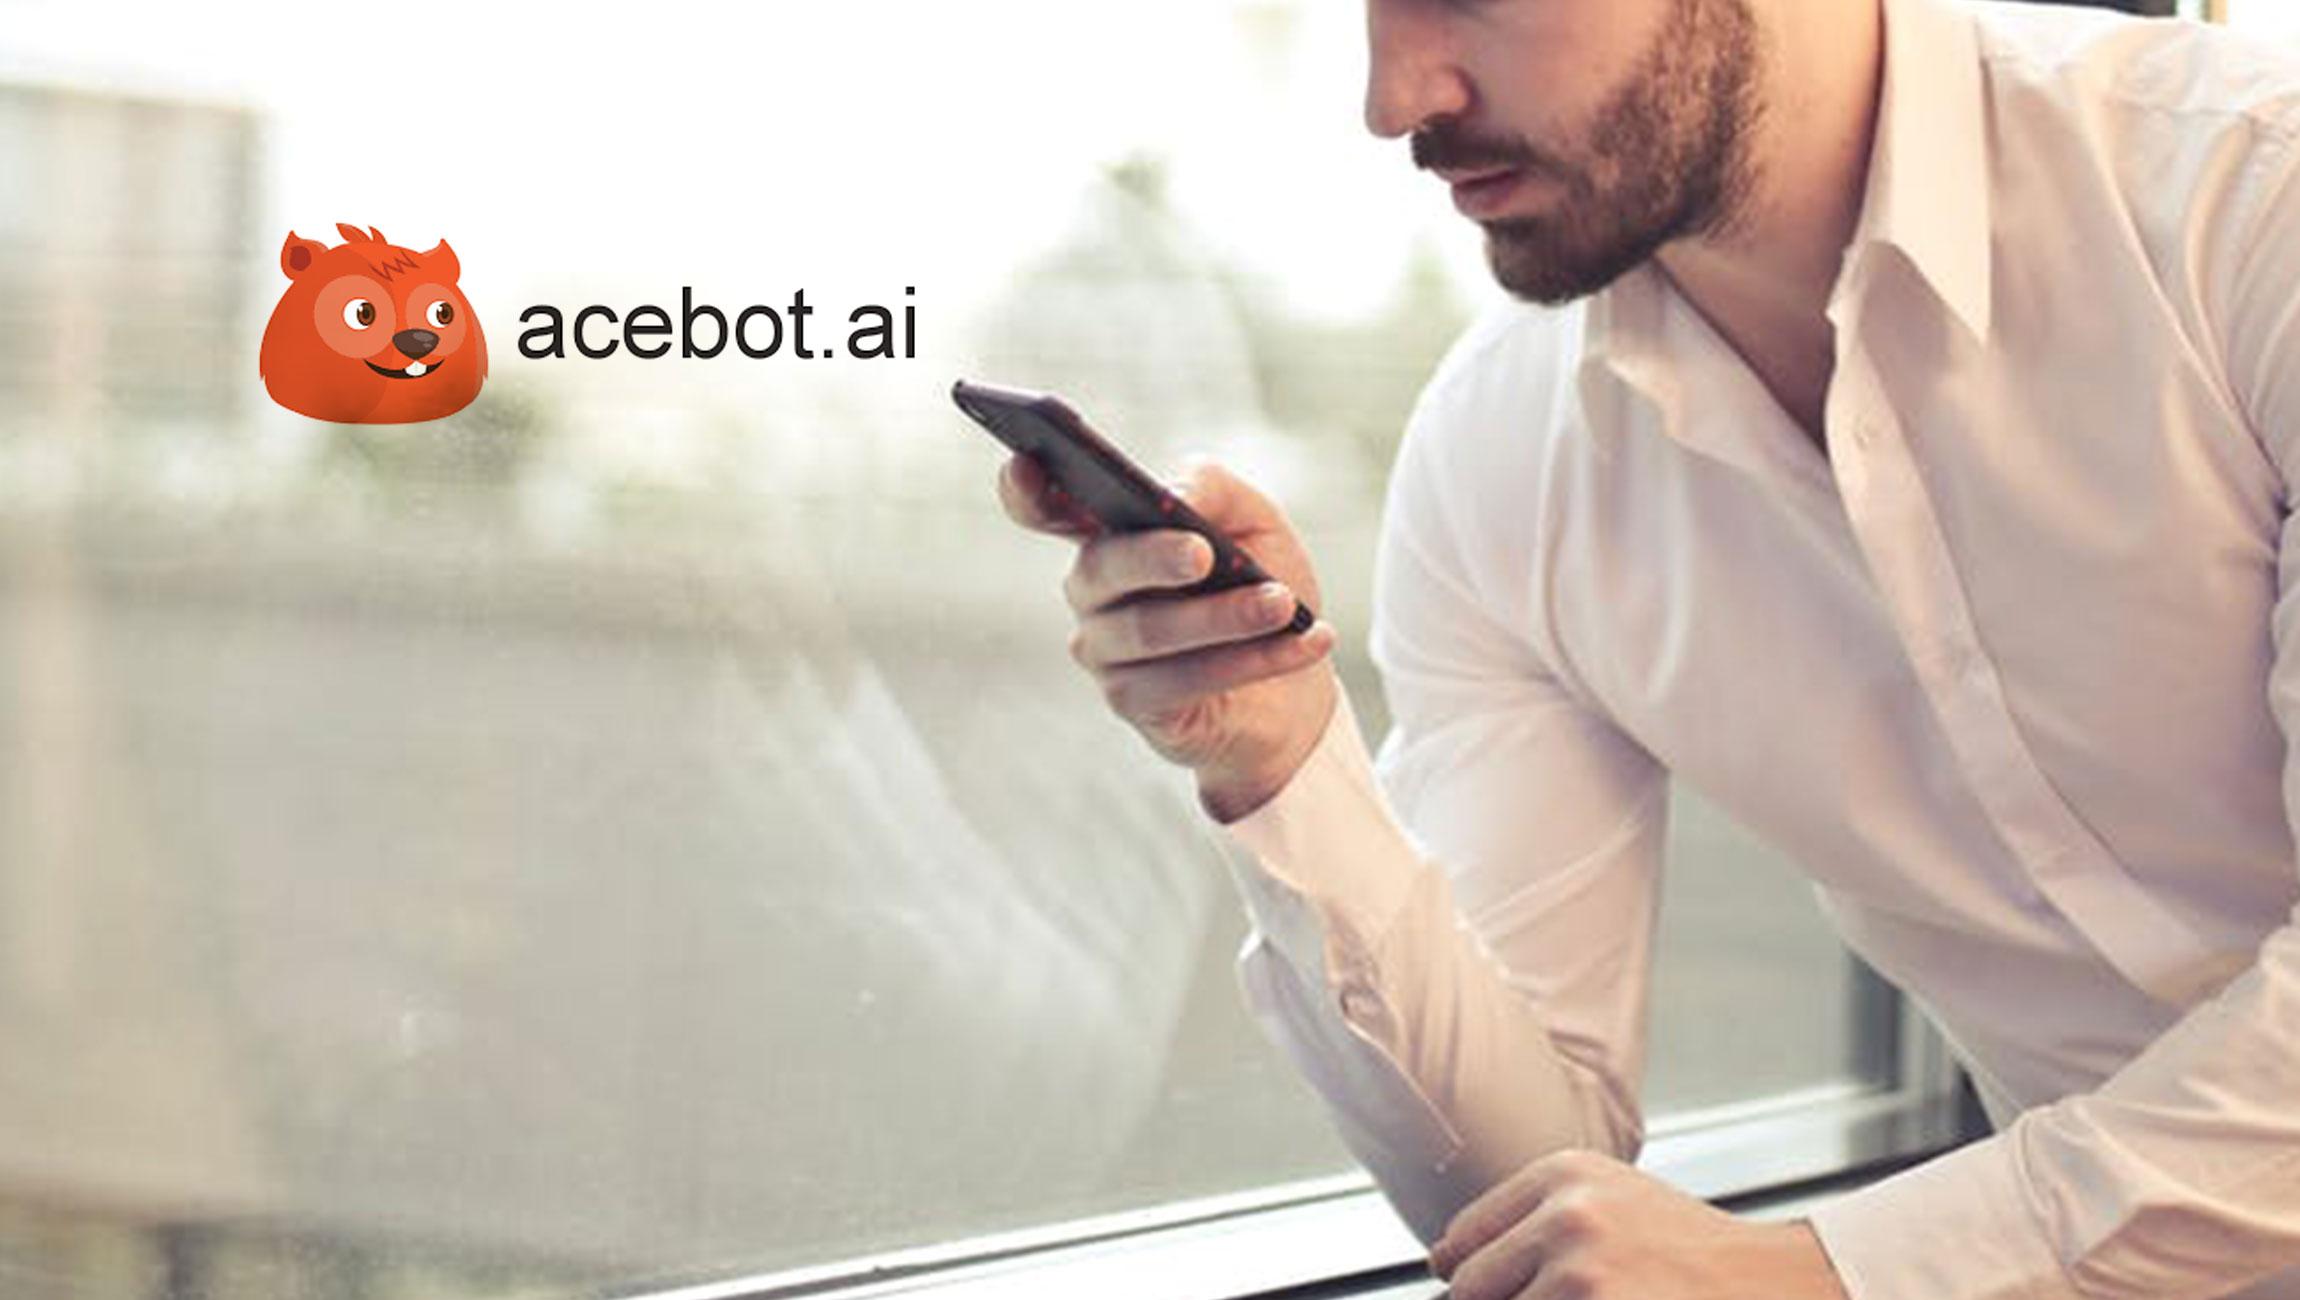 AceBot